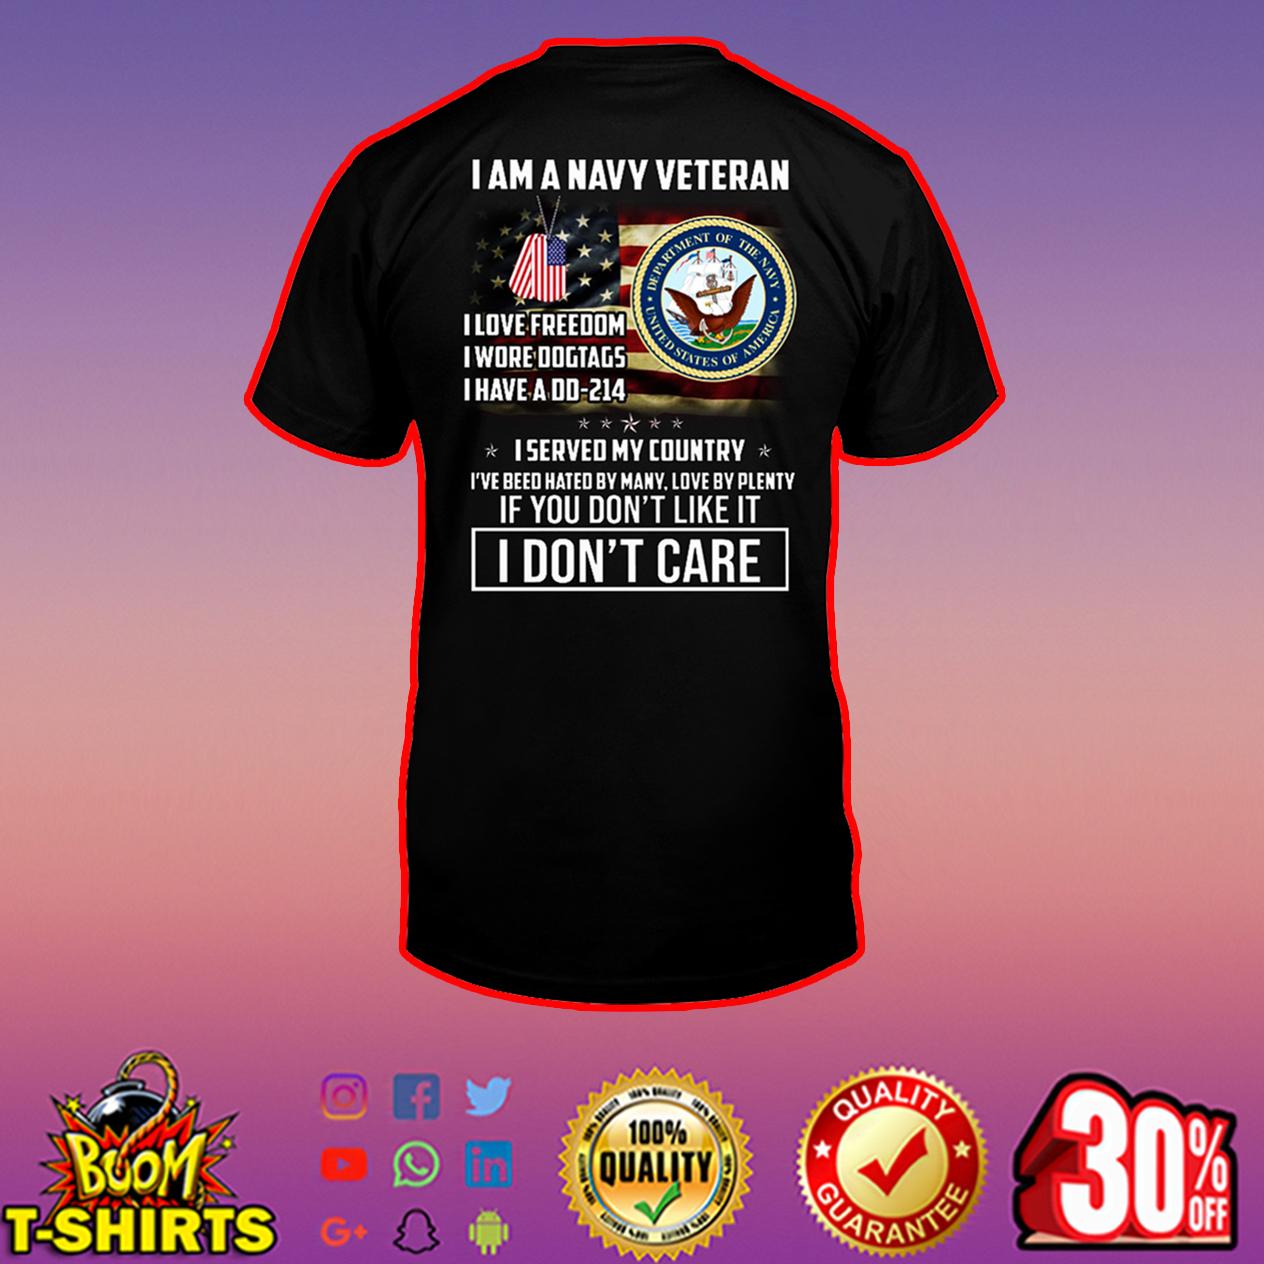 I am a Navy Veteran I love freedom I wore dogtags I have a DD-214 shirt